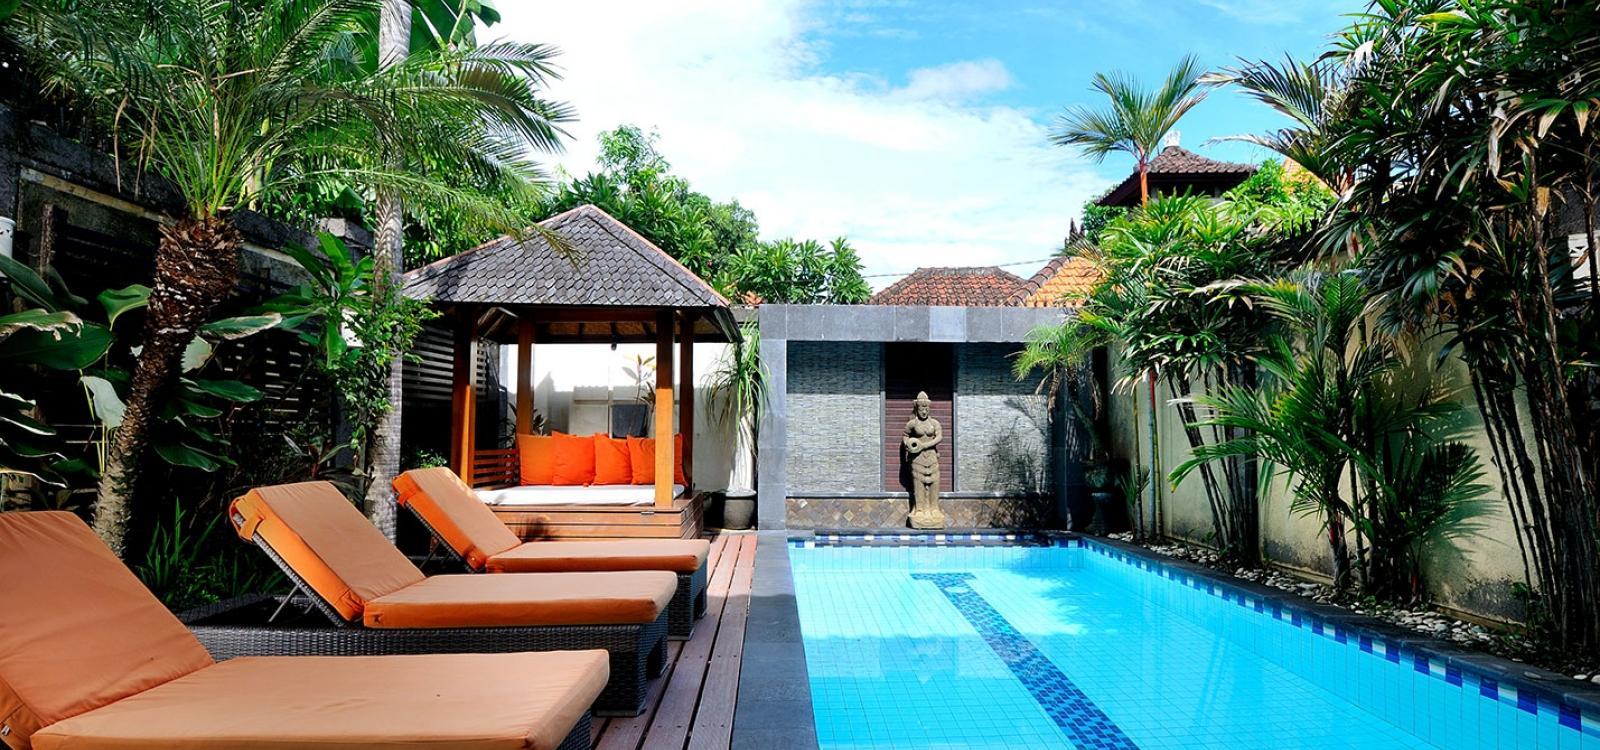 Property Cool Bali Villas Bali S Best Holiday Villas Villa Mimpi Legian Beach